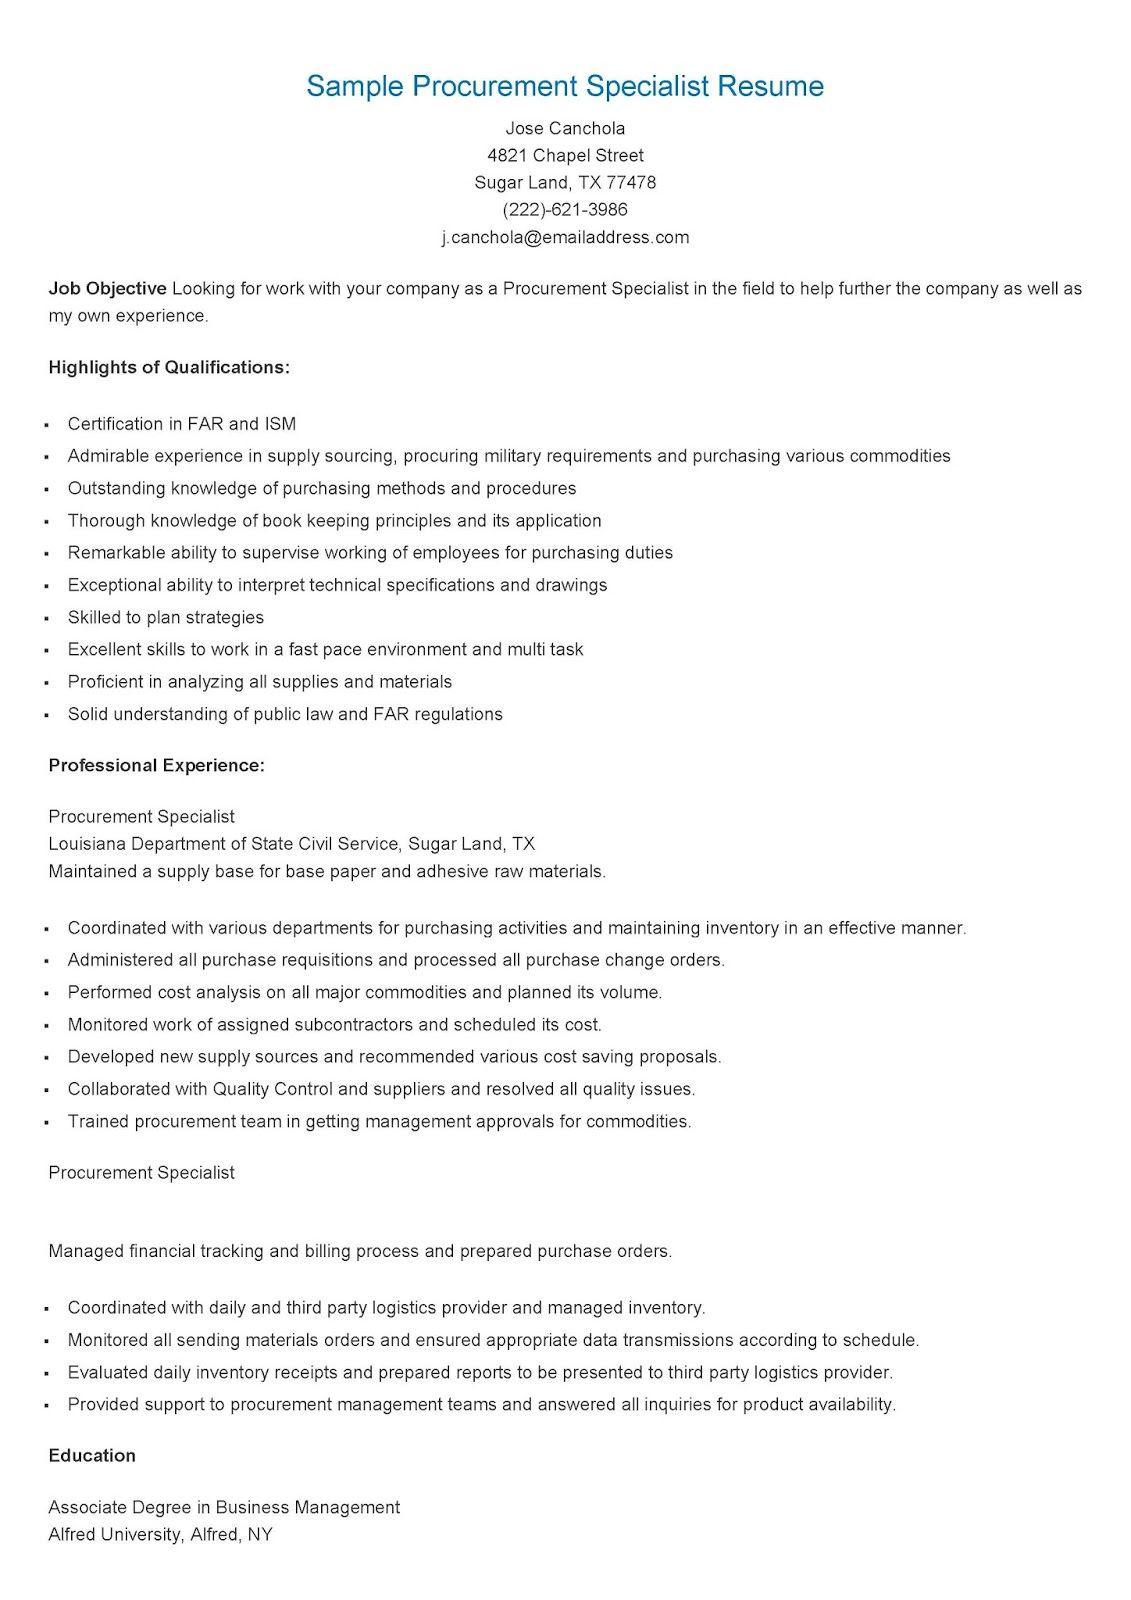 Sample Procurement Specialist Resume Resume Procurement Job Hunting